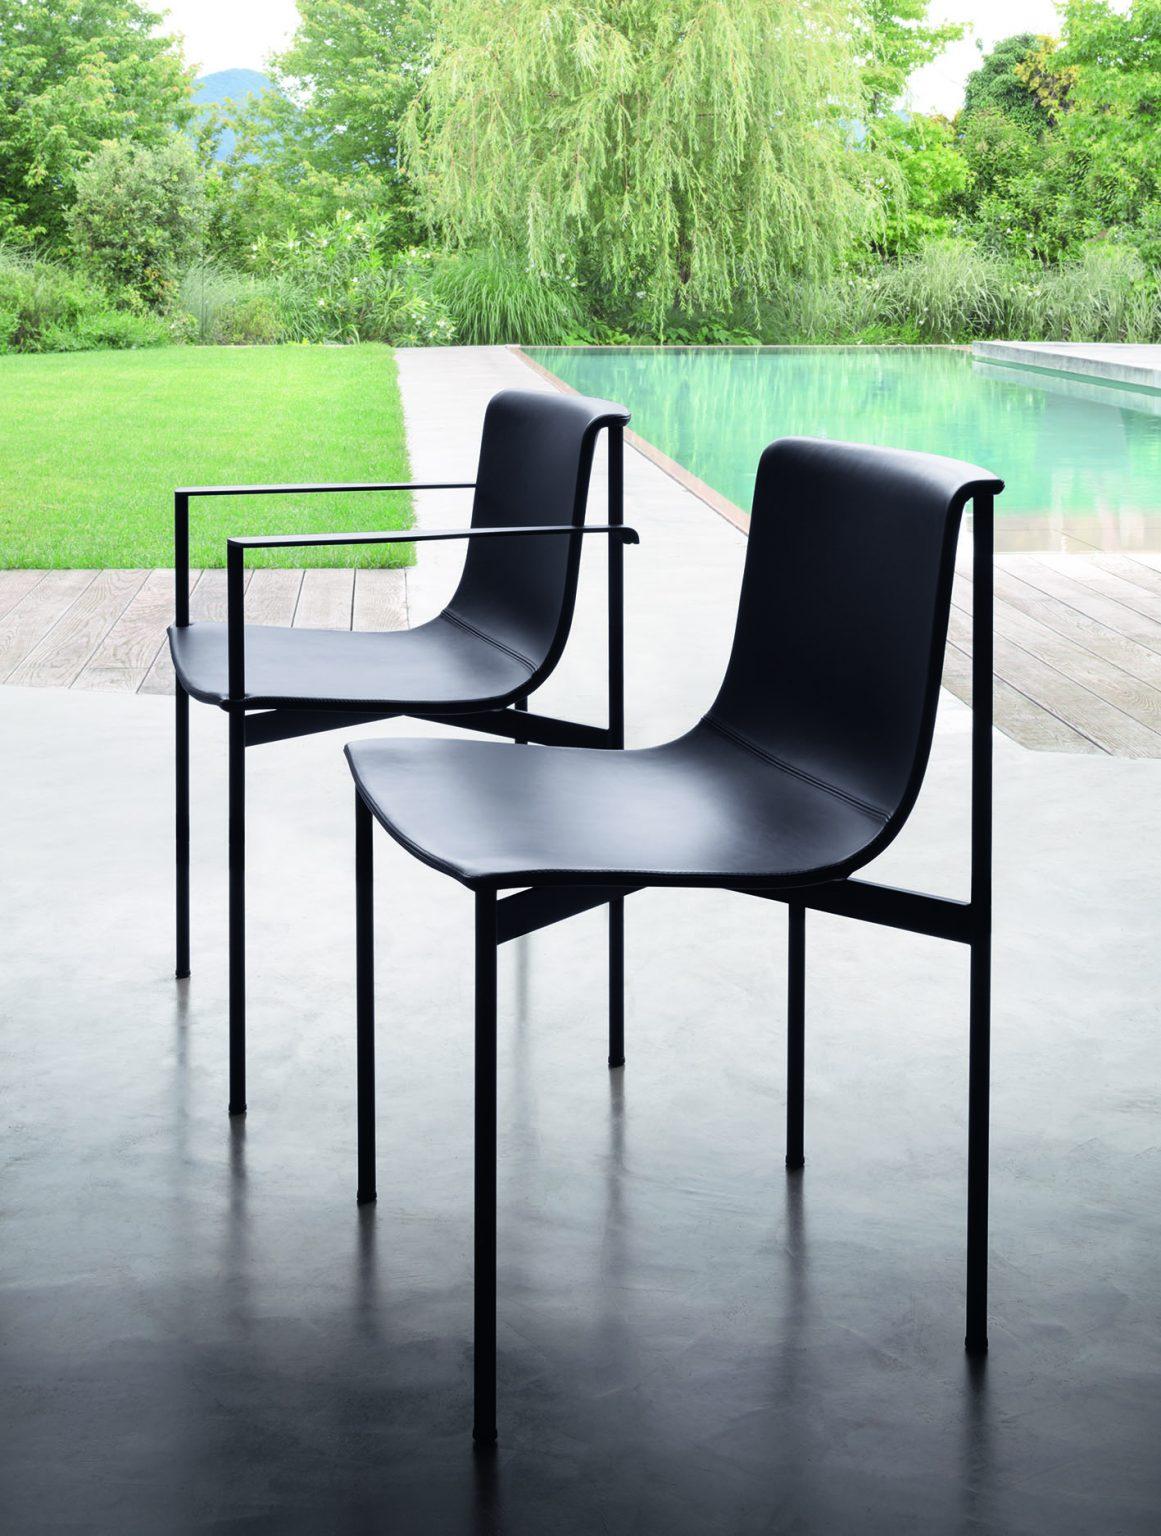 Biennale Interieur - Belgium's leading design and interior event - Lema-ombra-chair-piero-lissoni-1-2.jpg